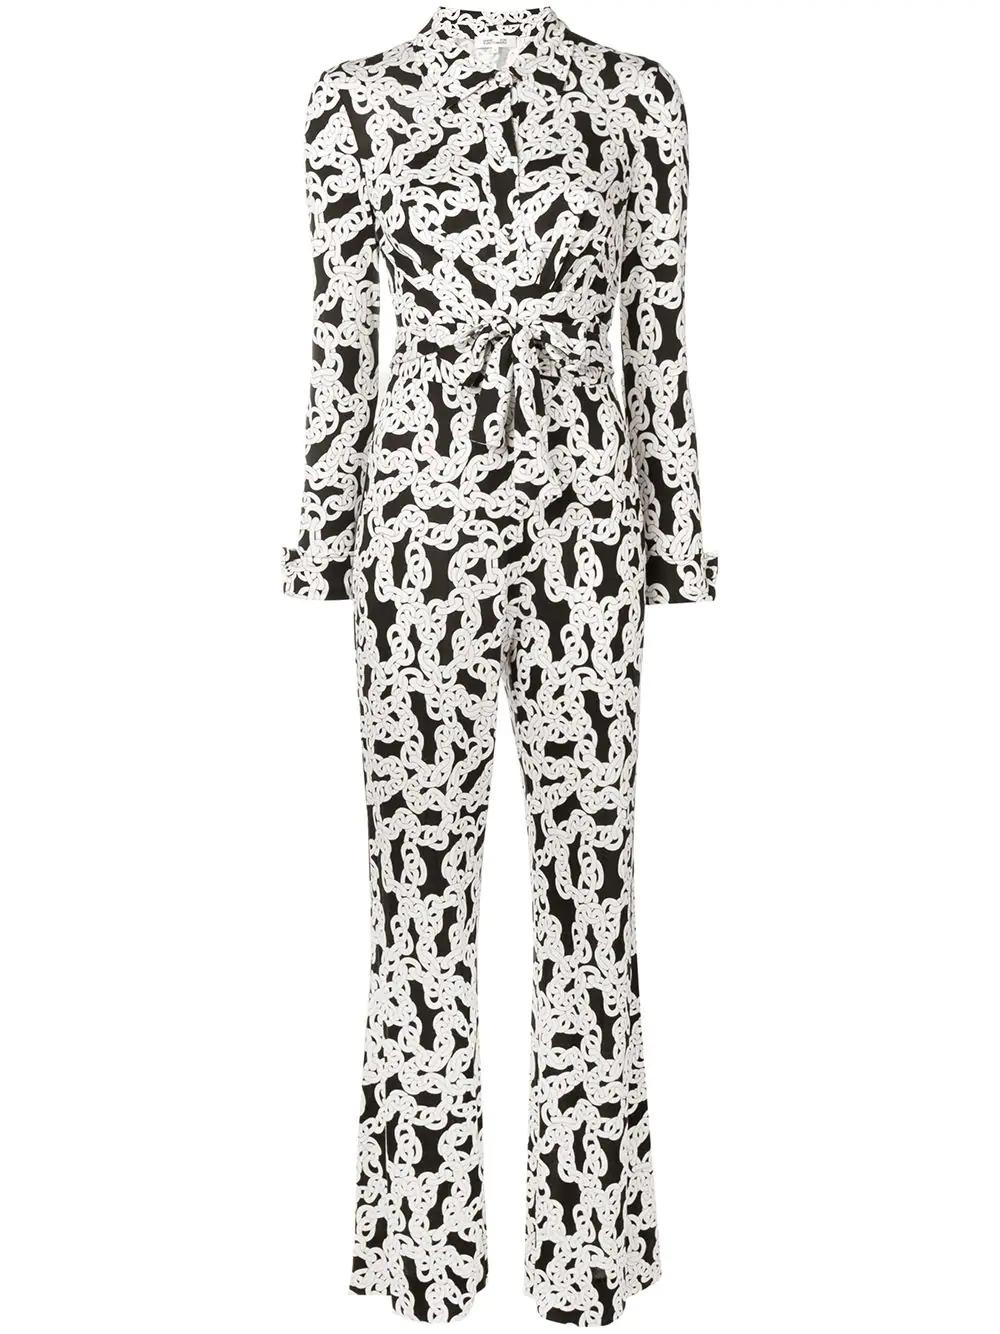 18726522bb5 White and black silk chain print jumpsuit from Dvf Diane Von Furstenberg  featuring a classic collar